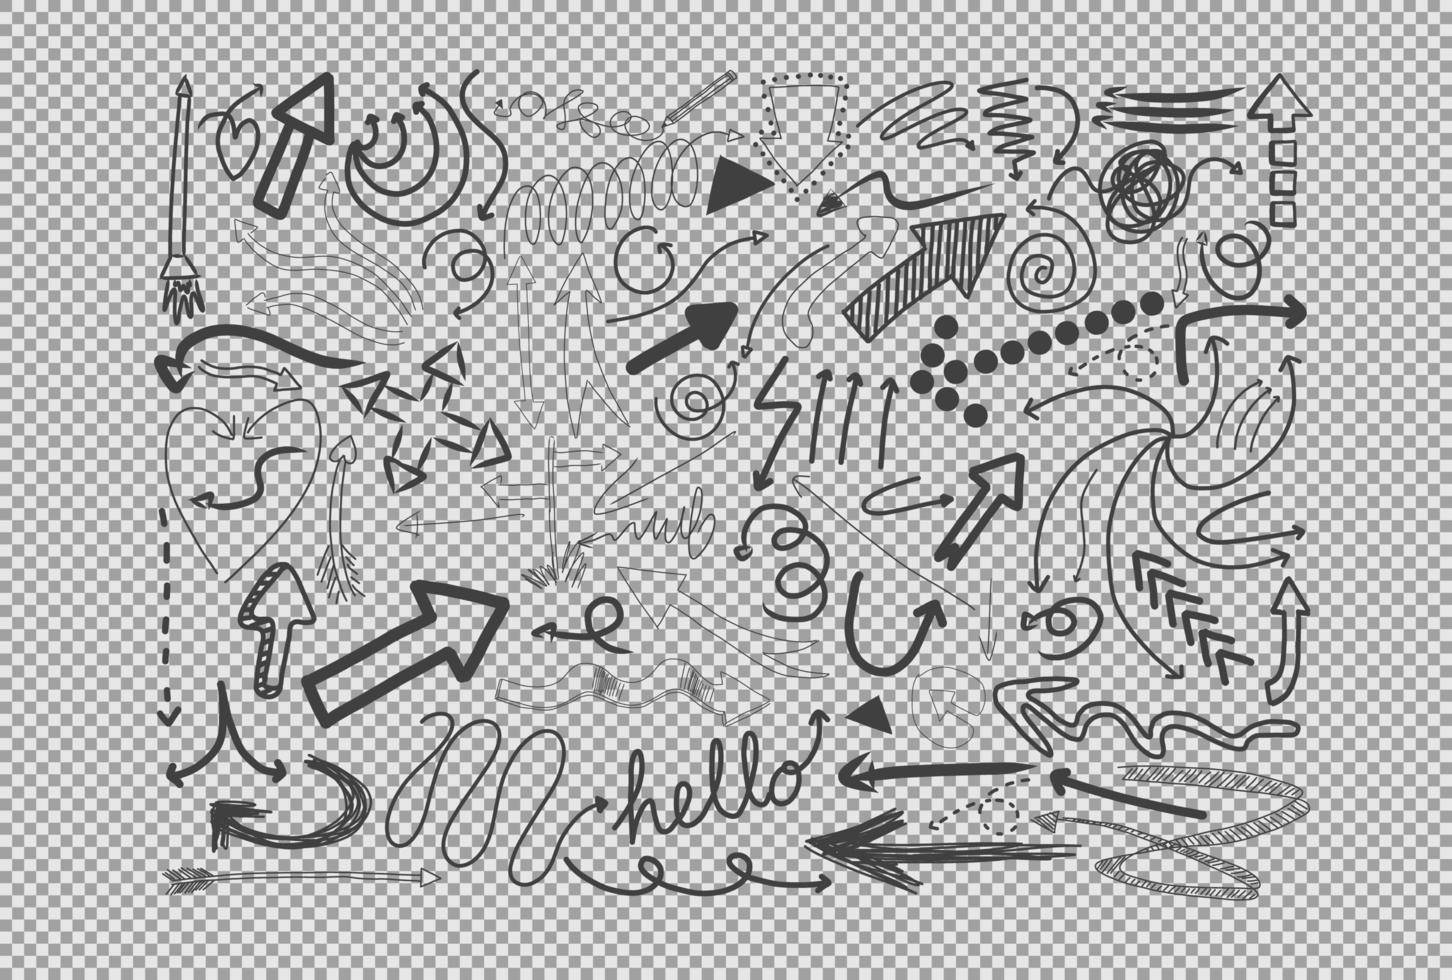 olika doodle stroke isolerad på transparent bakgrund vektor